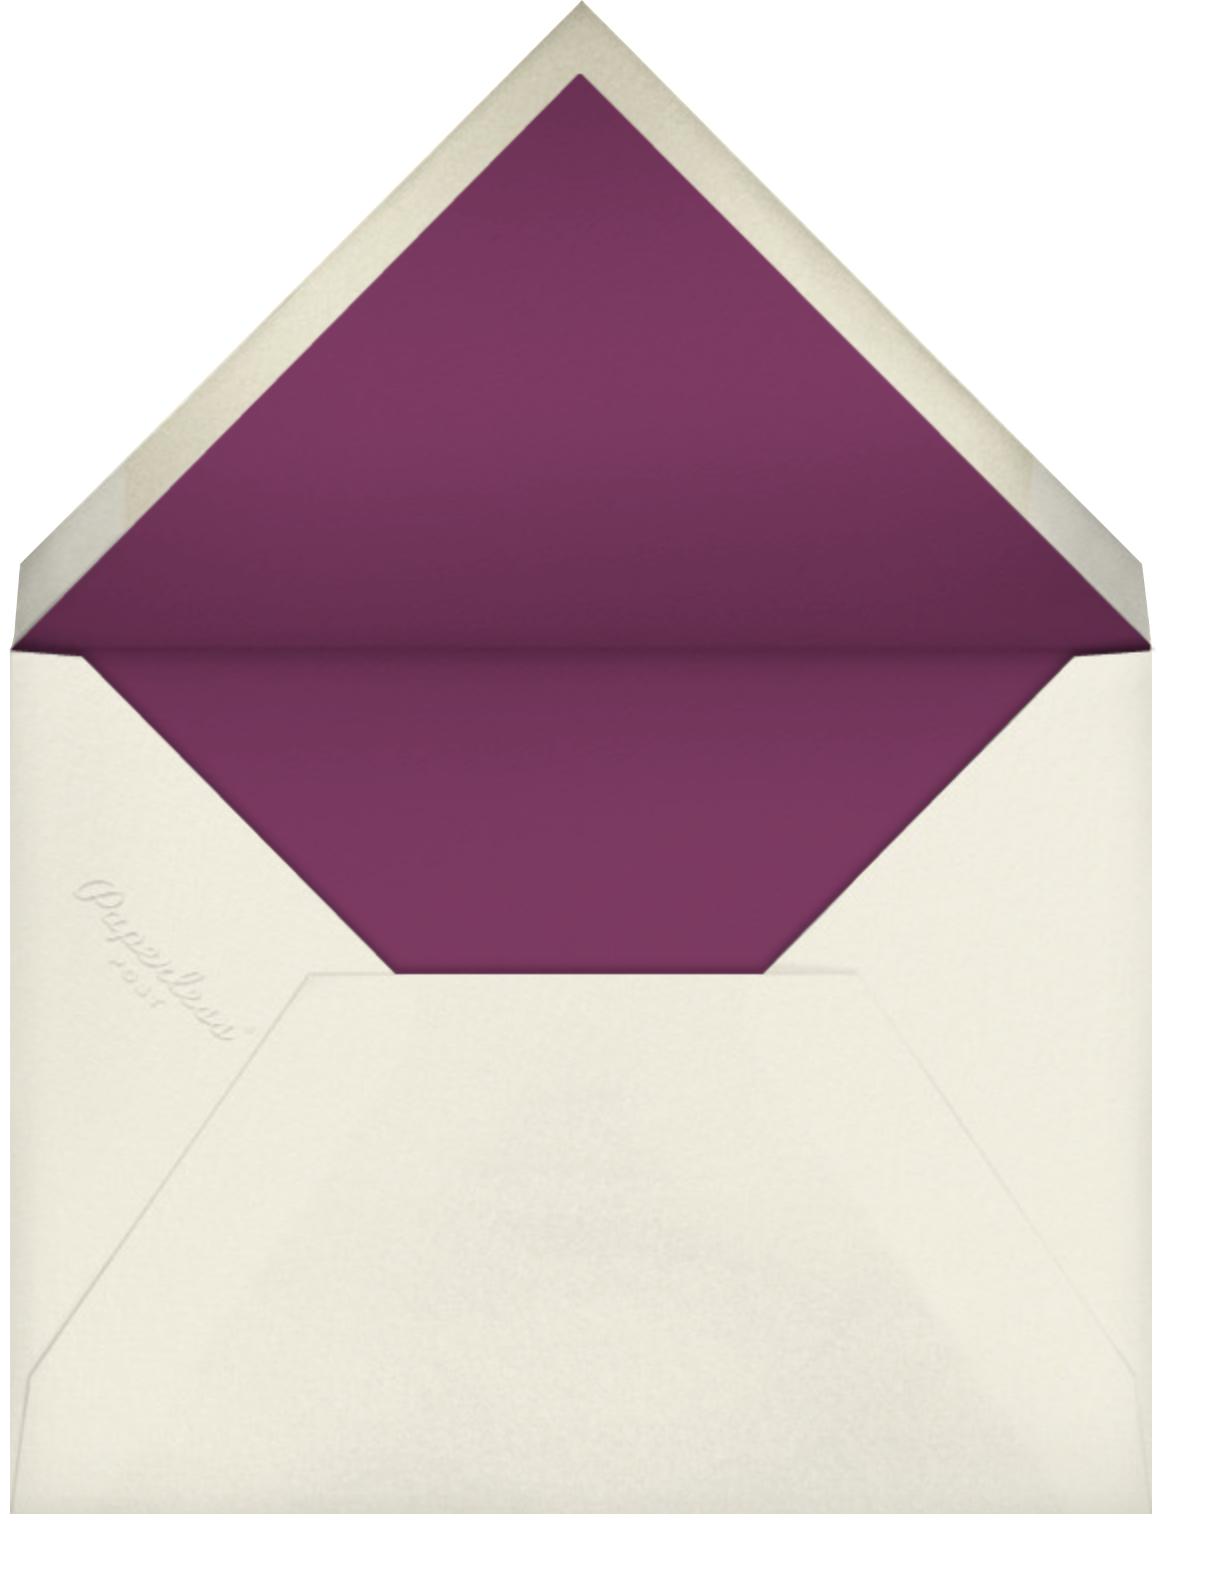 Varsity Hanukkah (1 Photo) - Citrus - Paperless Post - Hanukkah - envelope back